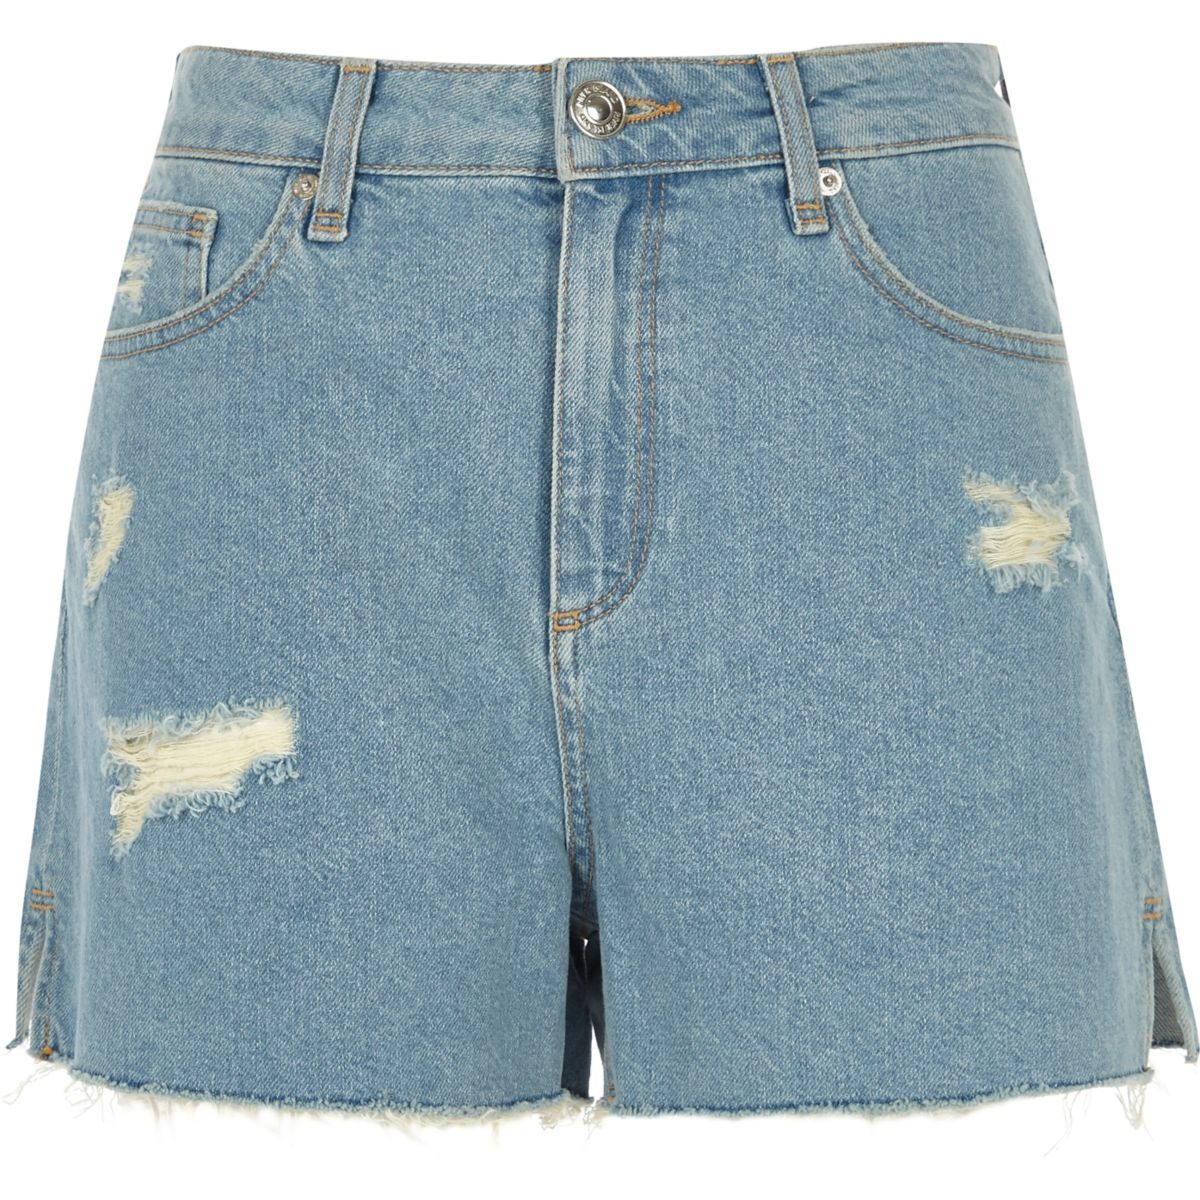 Light blue raw hem distressed shorts